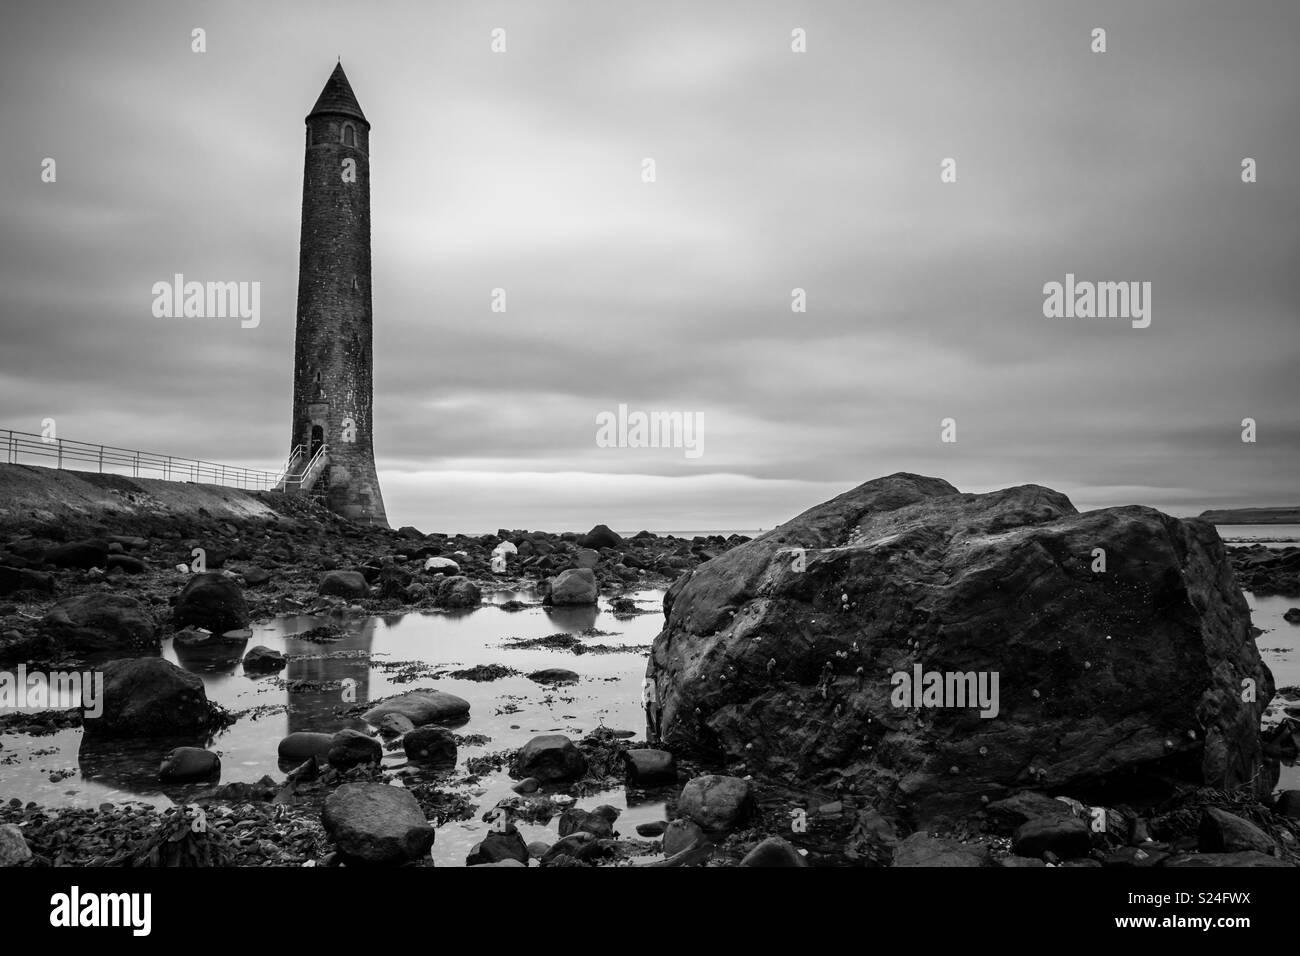 The Chaine Memorial, Larne, Northern Ireland - Stock Image